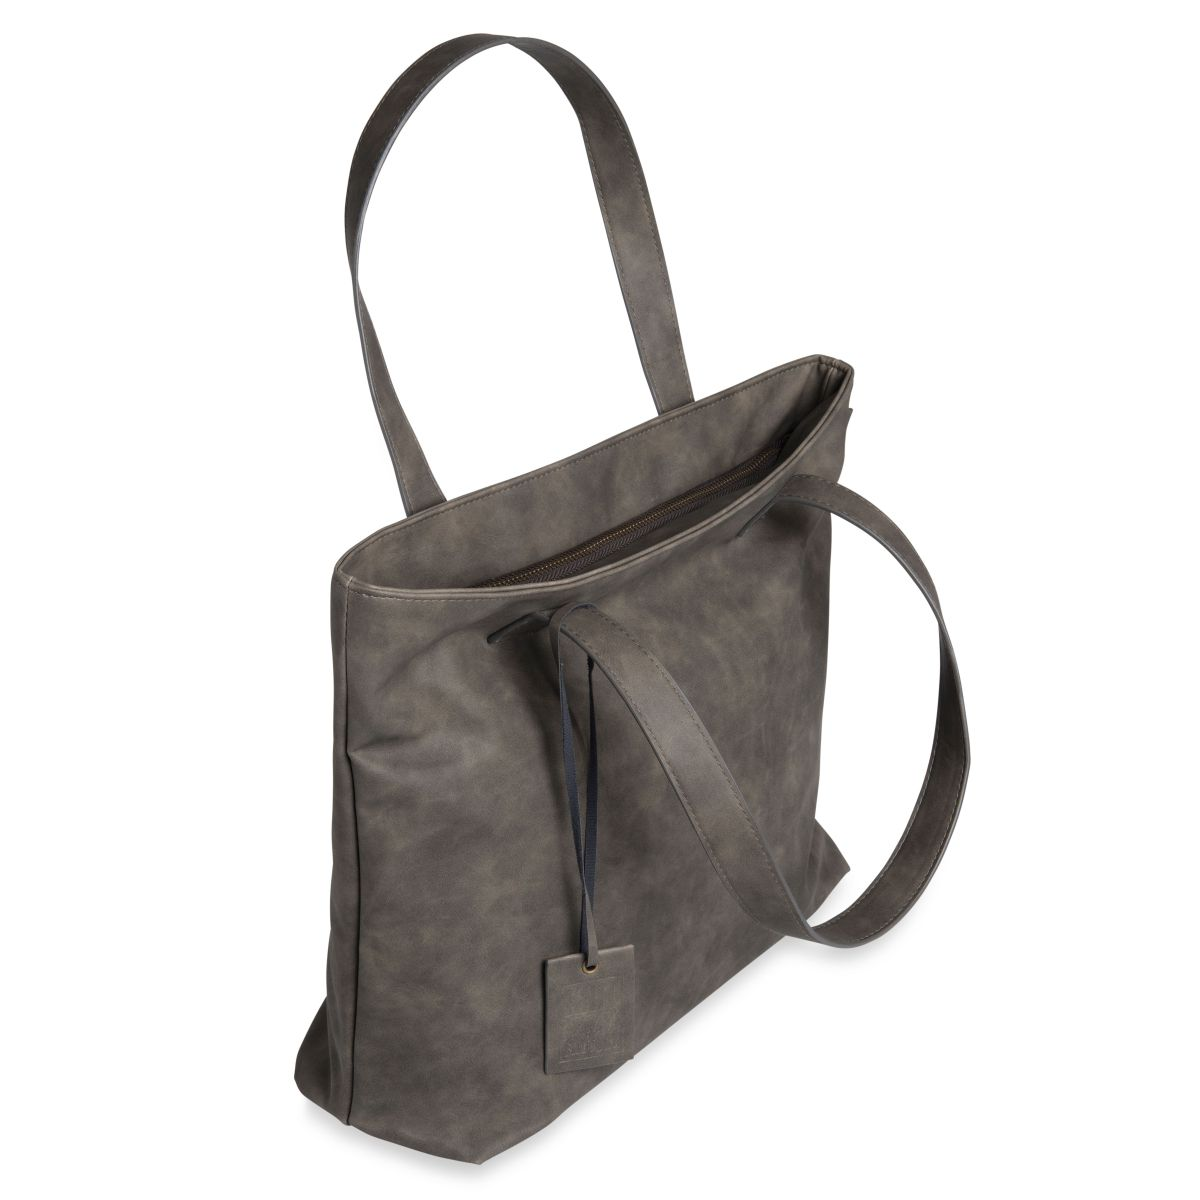 sofia handbag khaki